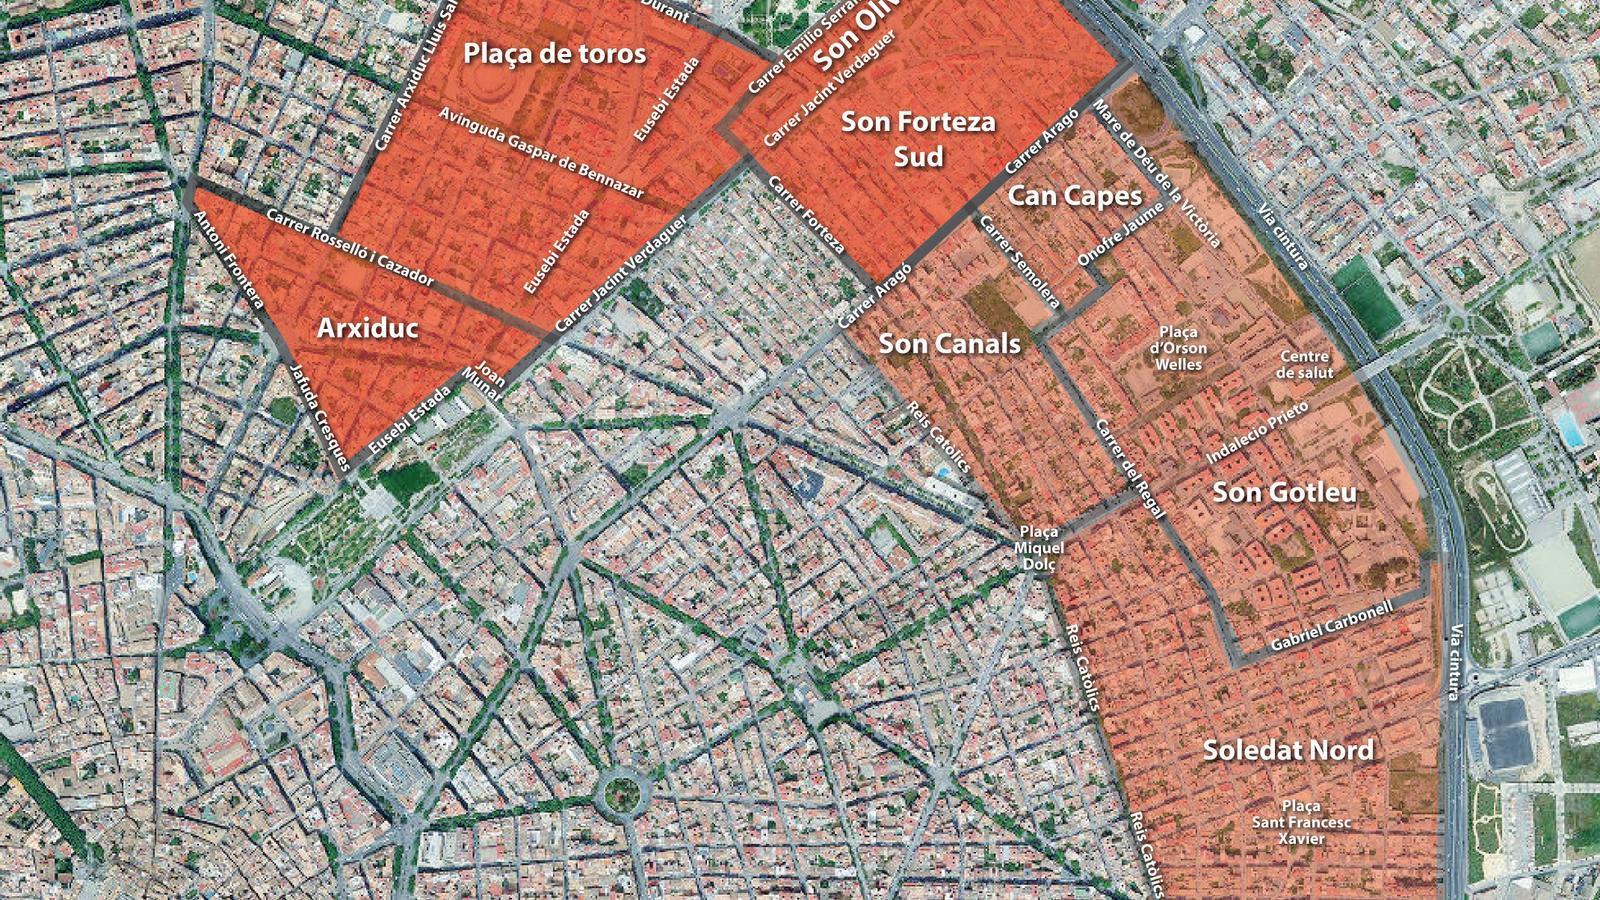 Mapa de les zones confinades de Palma.